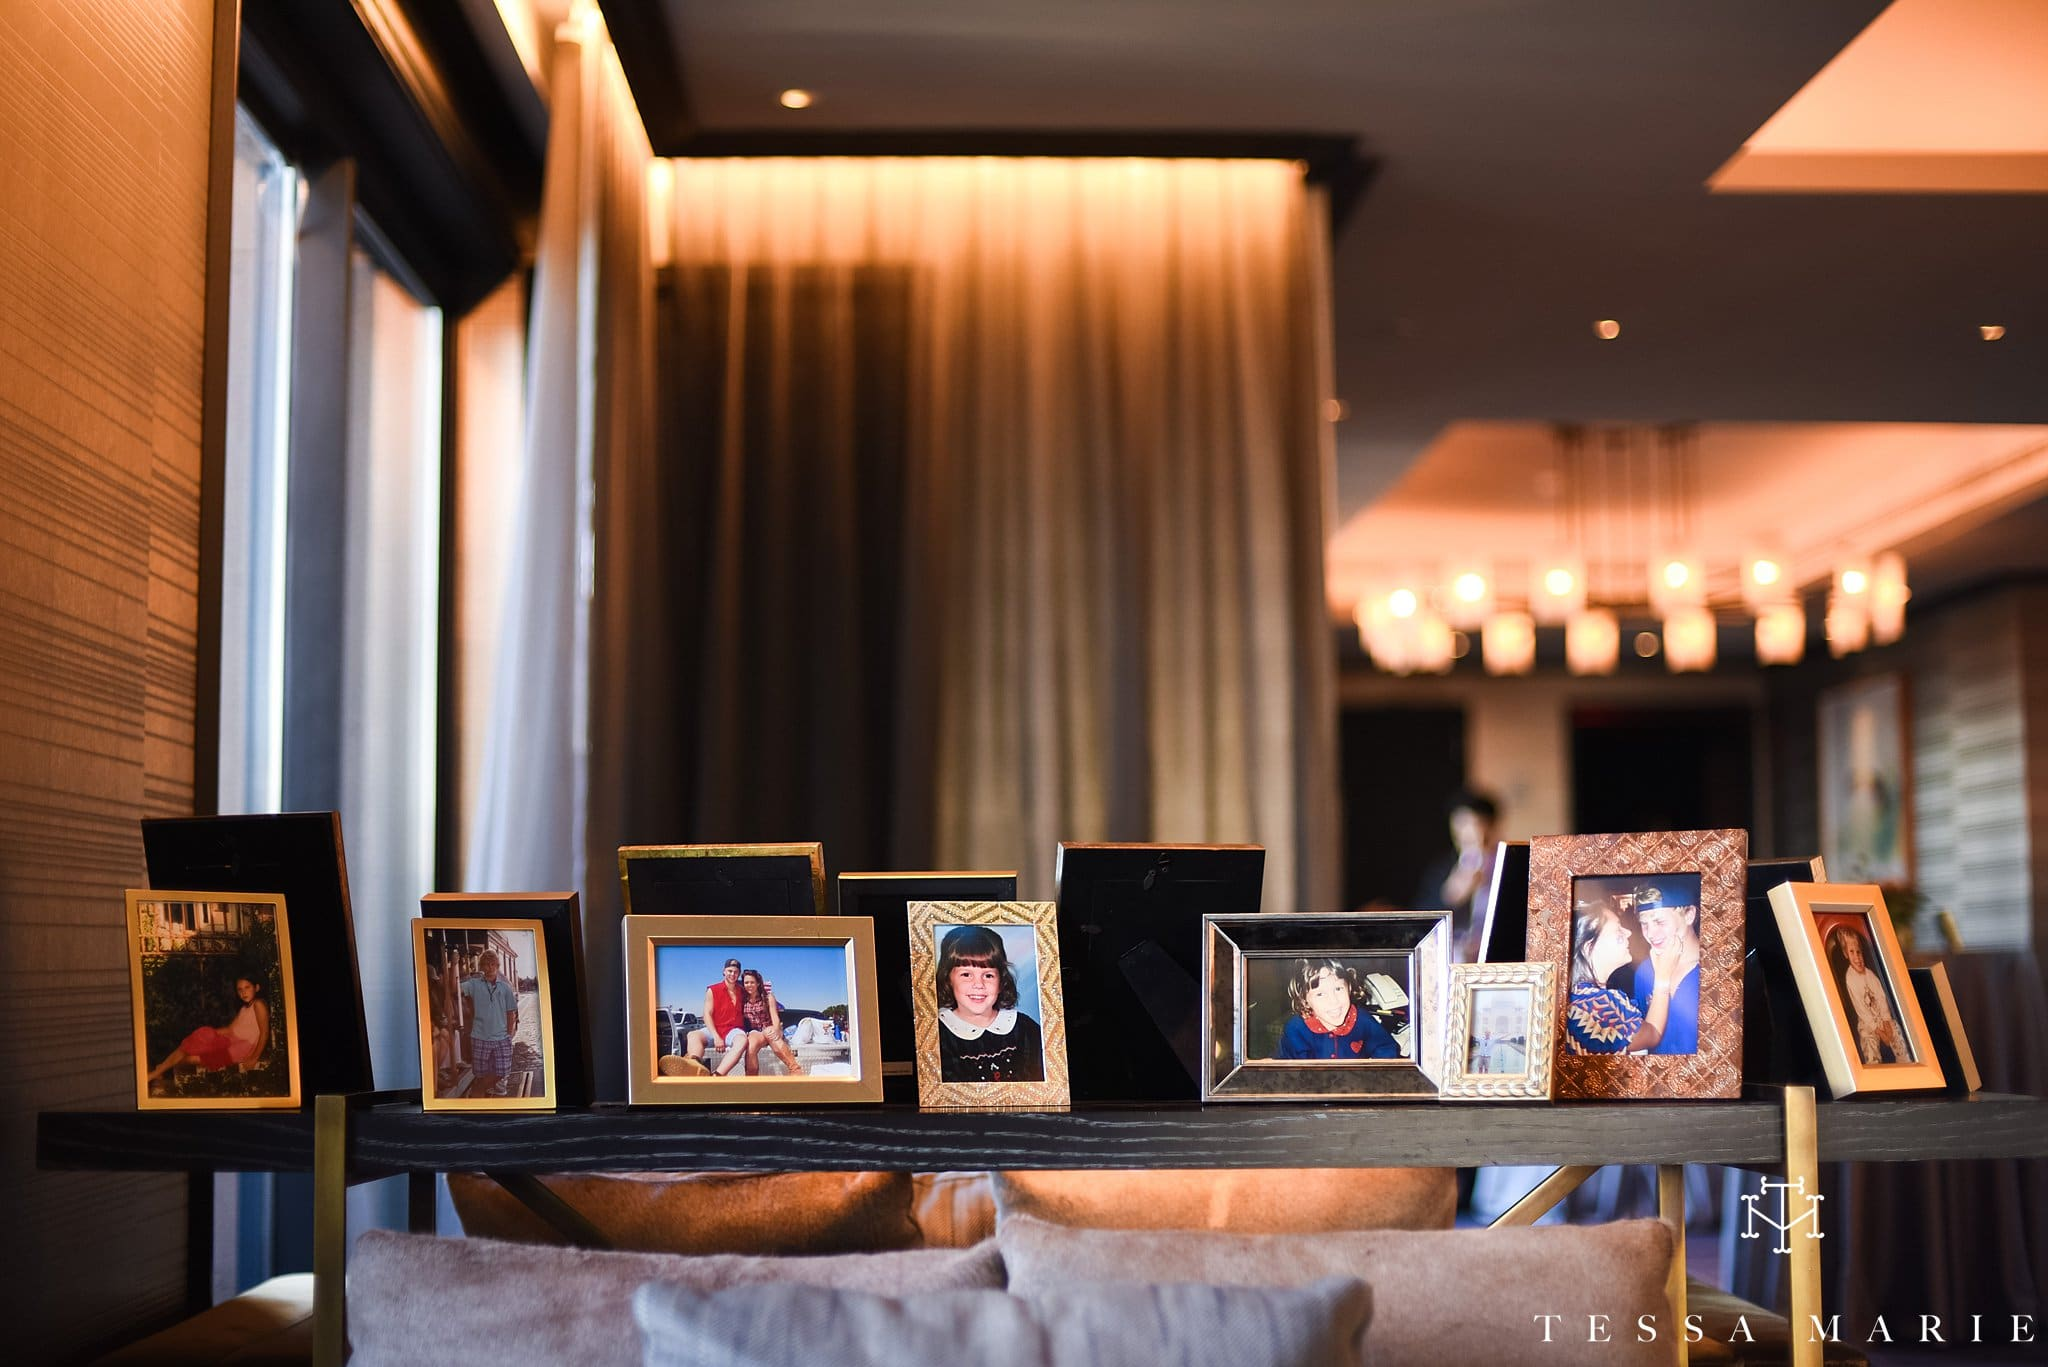 tessa_marie_Weddings_four_seasons_rehersal_dinner_pictures_wedding_atlanta_wedding_getting_married_0001.jpg